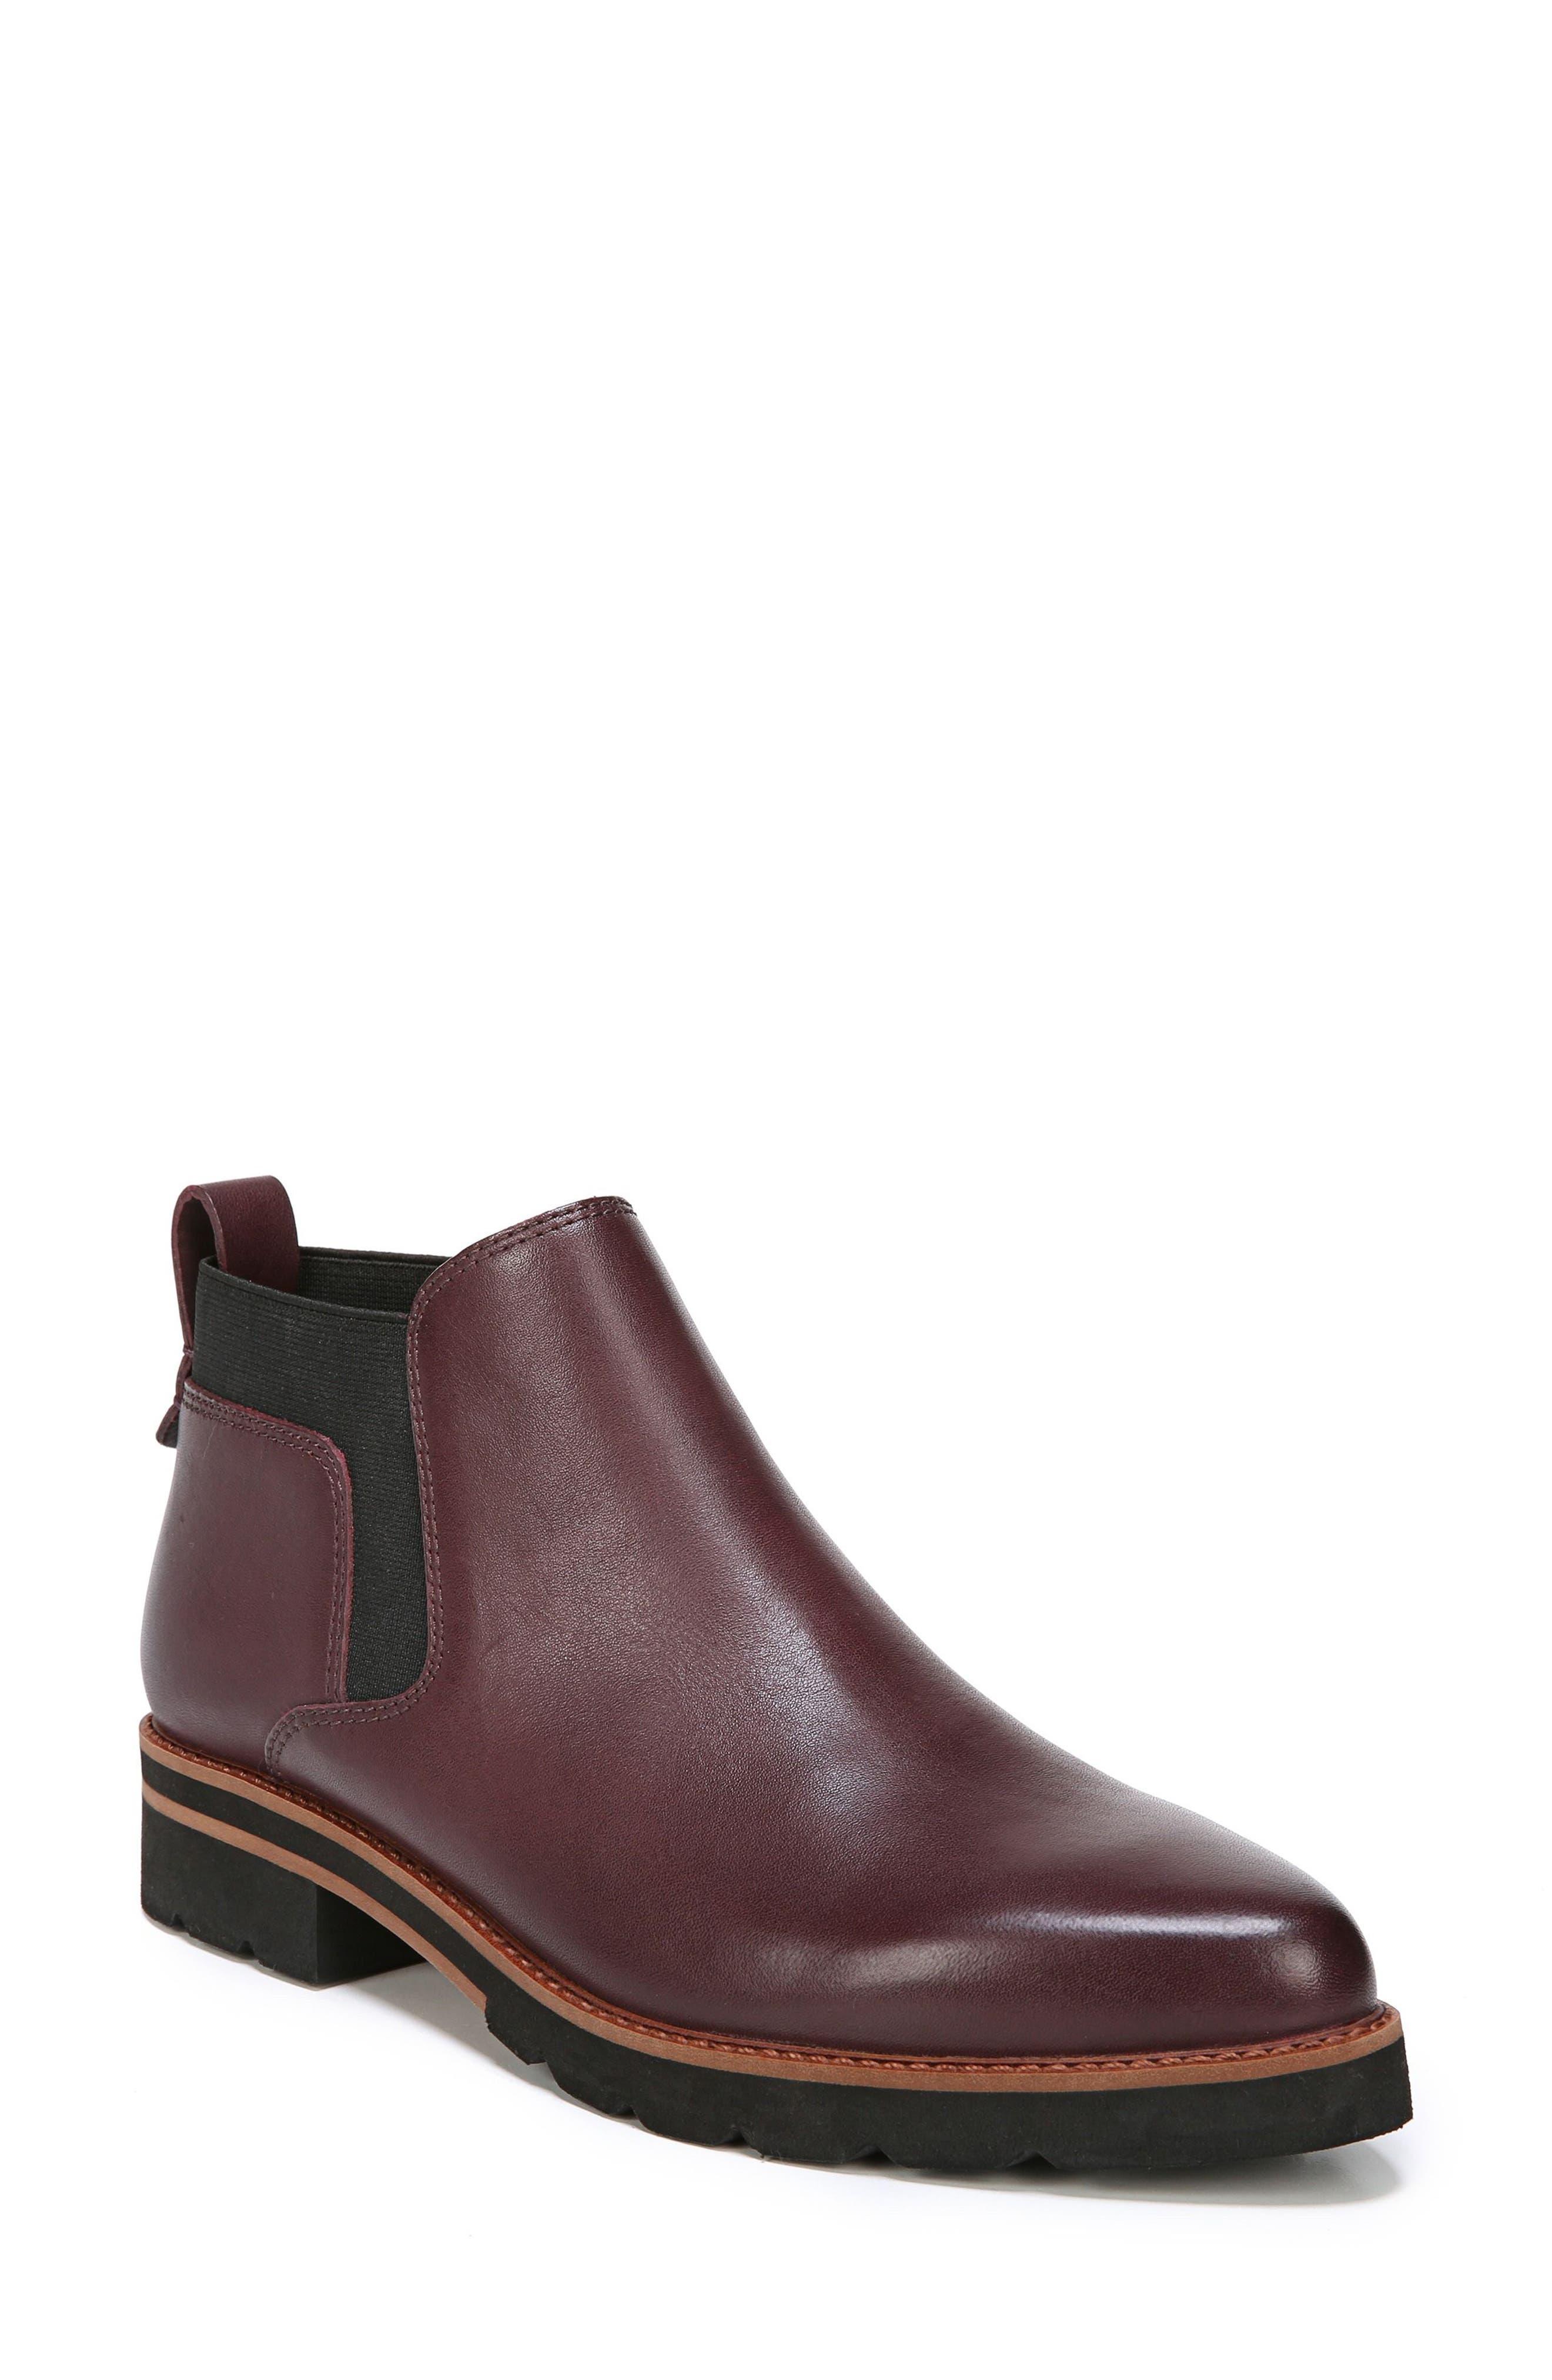 Bringham Bootie,                         Main,                         color, Dark Burgundy Leather